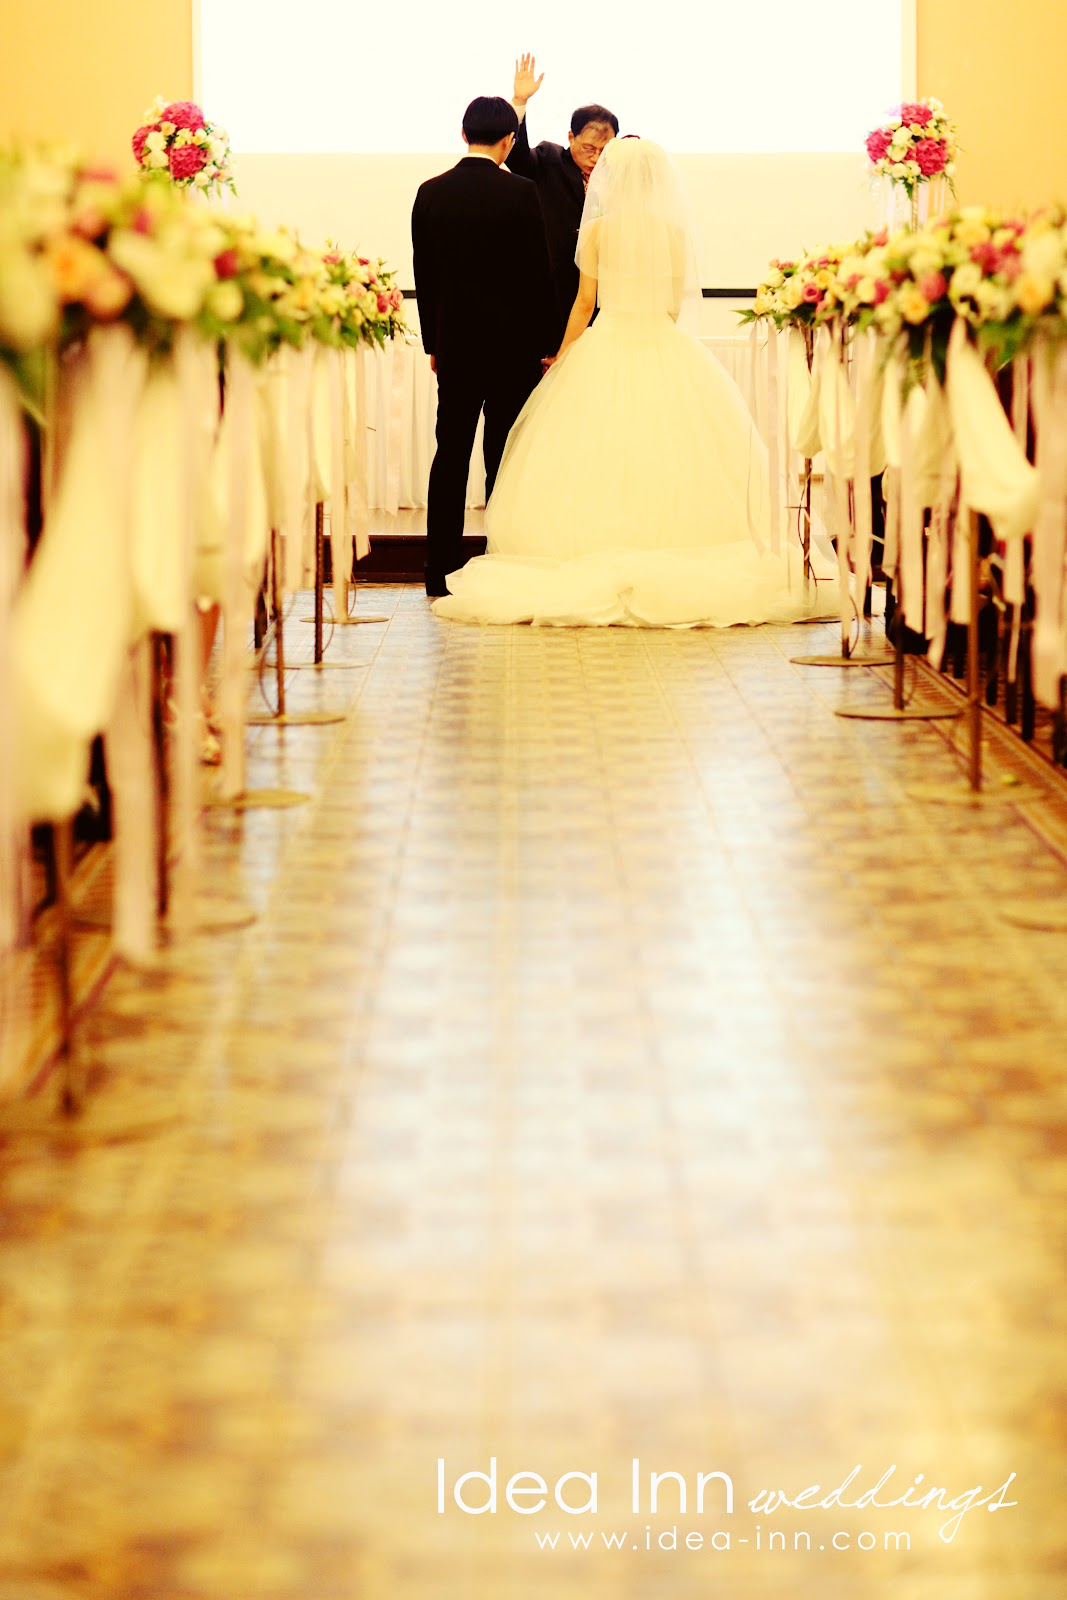 church decoration wedding singapore aisle blessing